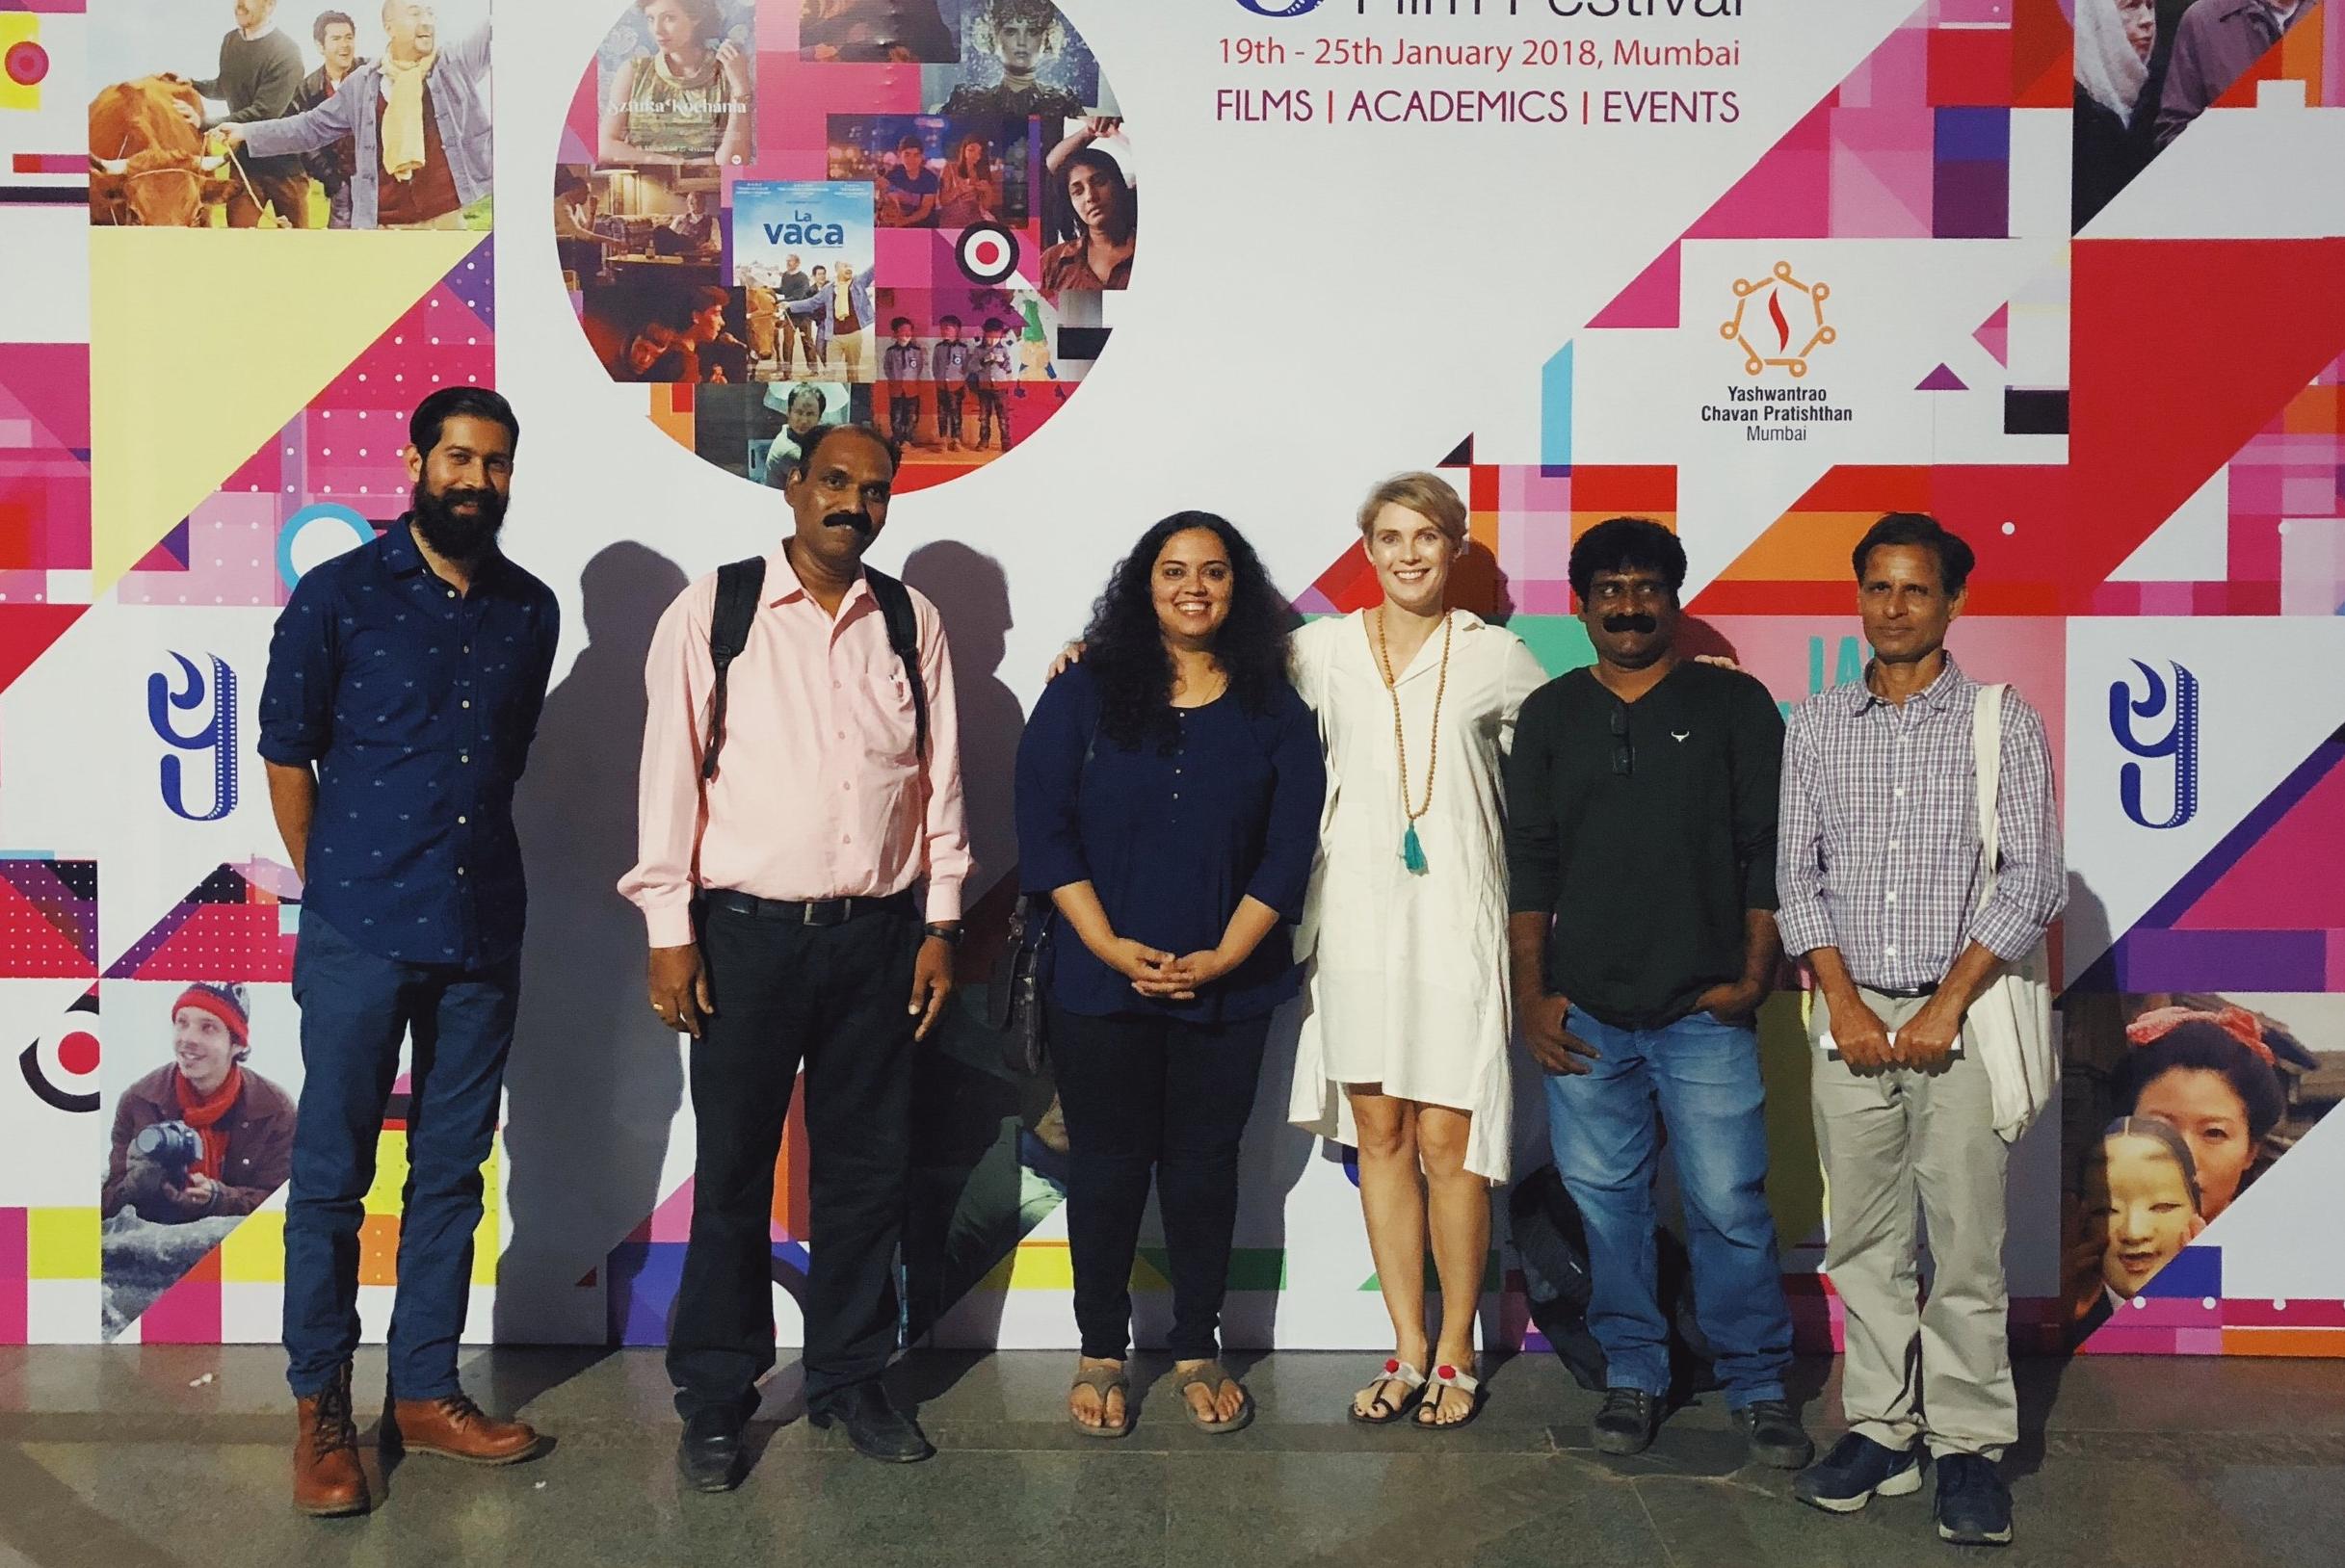 - The JUGAAD crew at our Mumbai premiere! Left to right: Composer Shane Mendonsa, taxi decorator Sameer Mistry, production coordinator/sound recordist Amrita Singh, producer/director Susannah Heath-Eves, Dharavi fixer Rajesh Prabhakar, sound recordist Santosh Gour.